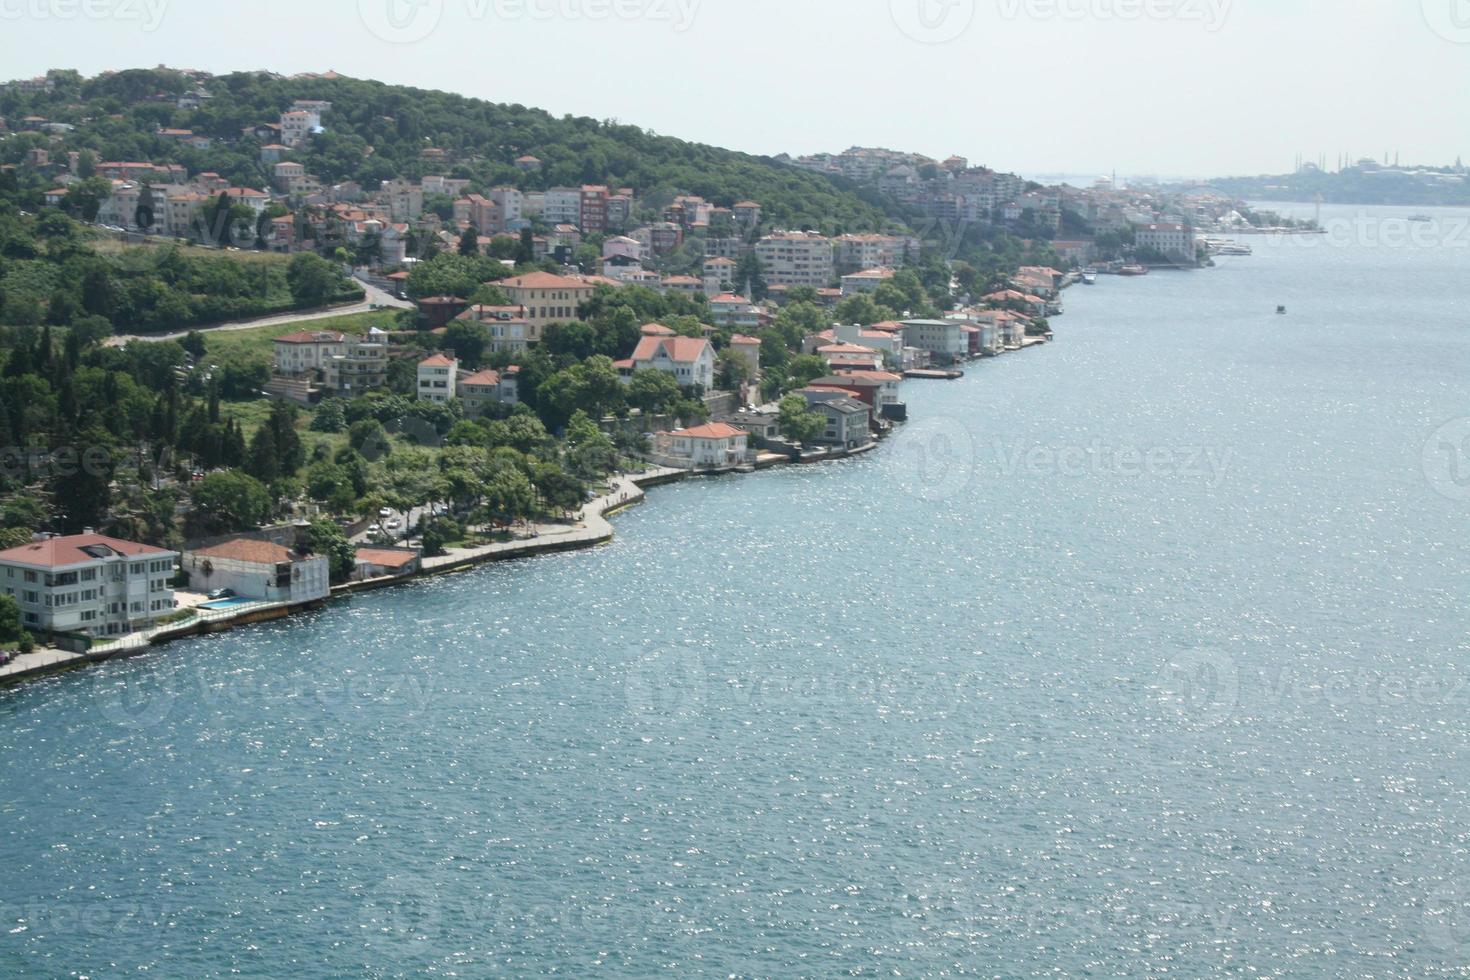 asfiska kusten i Bosphorus 3 foto